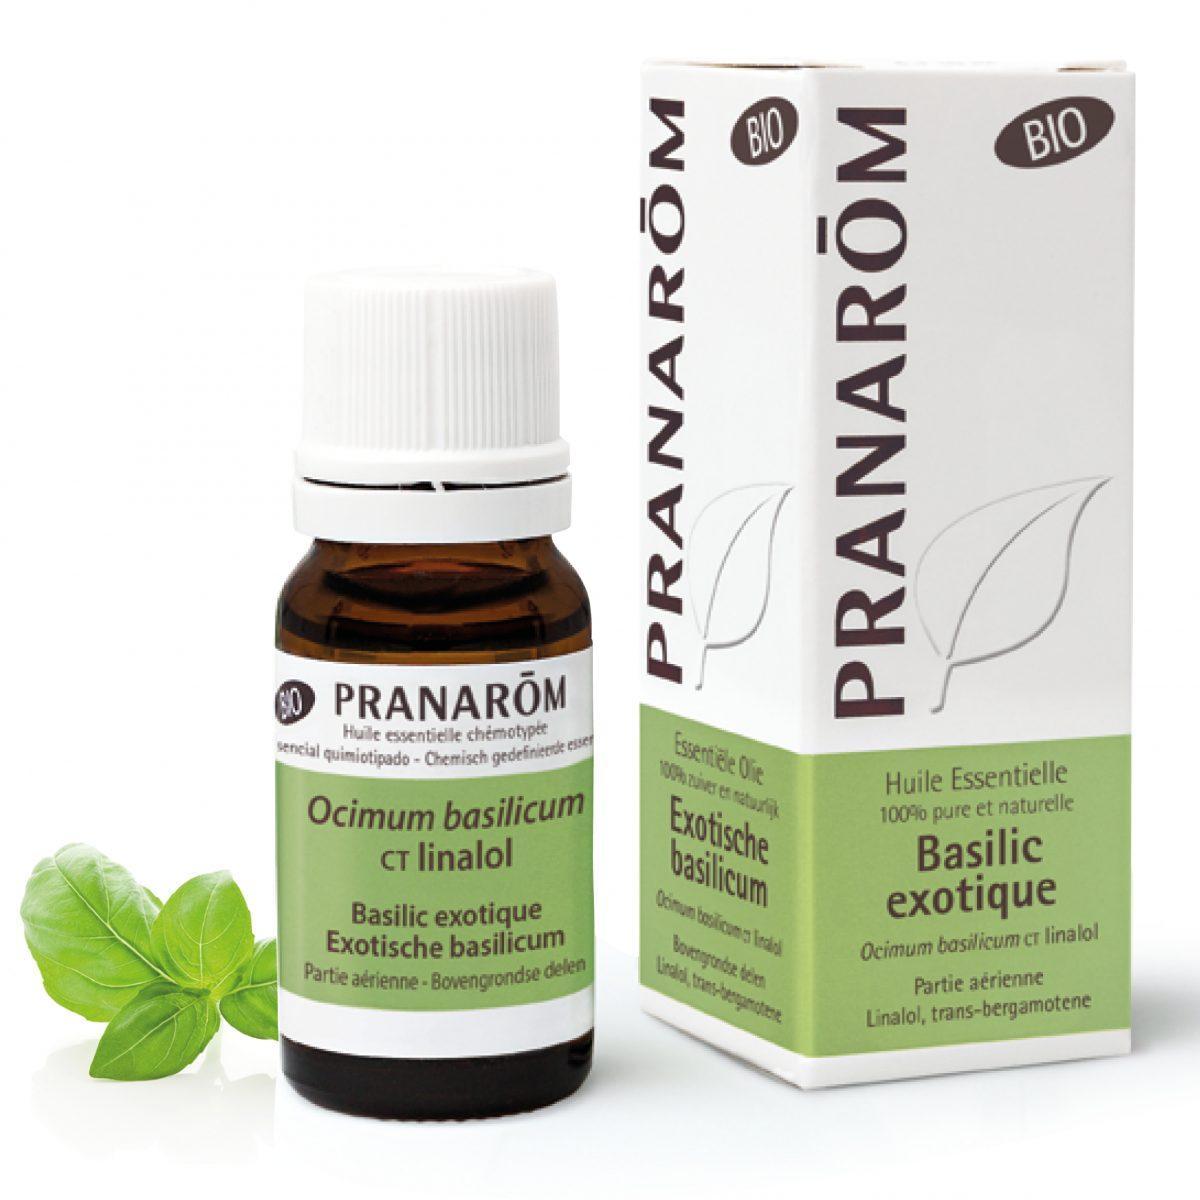 huile essentielle de basilic exotique bio